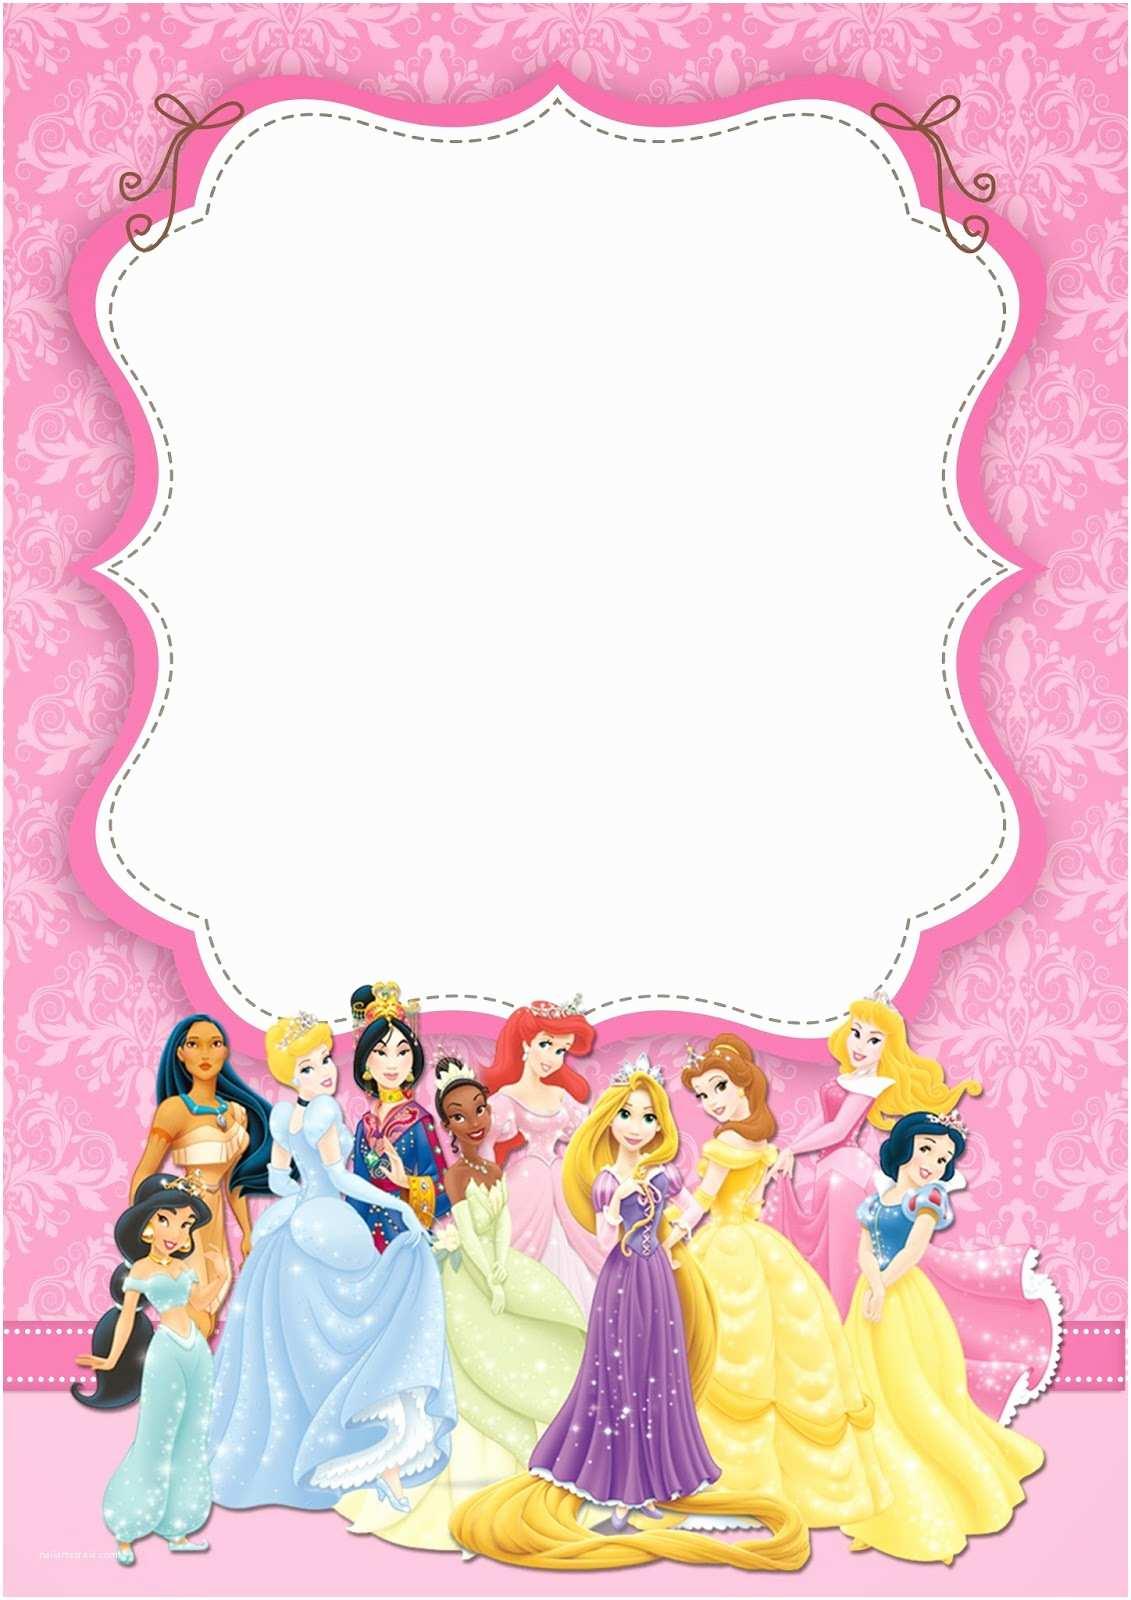 Disney Princess Party Invitations Disney Princess Party Free Printable Party Invitations